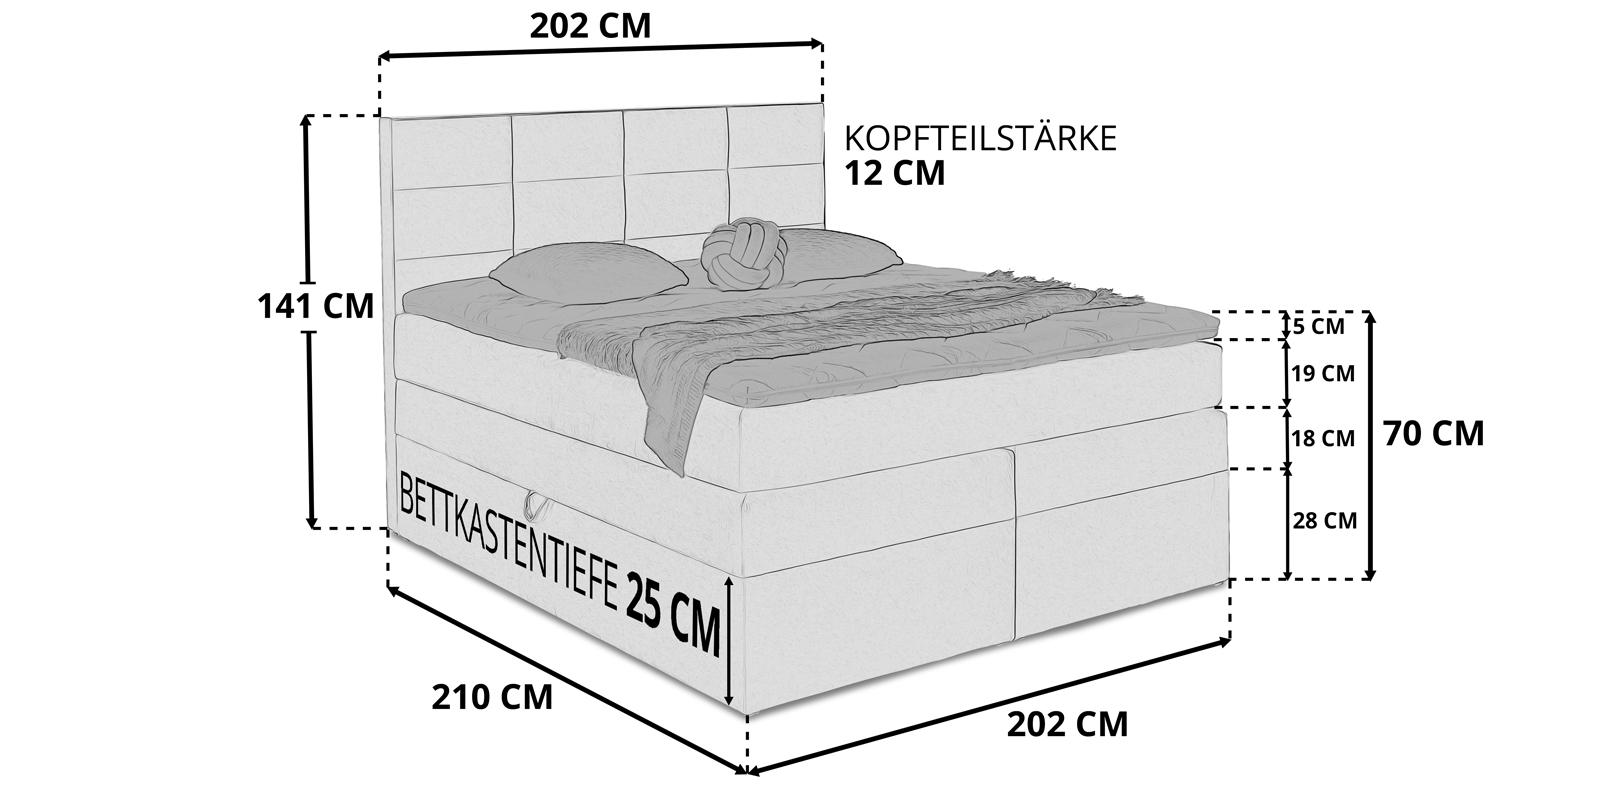 Boxspringbett Bettkasten Stauraum Bella 200x200 Skizze